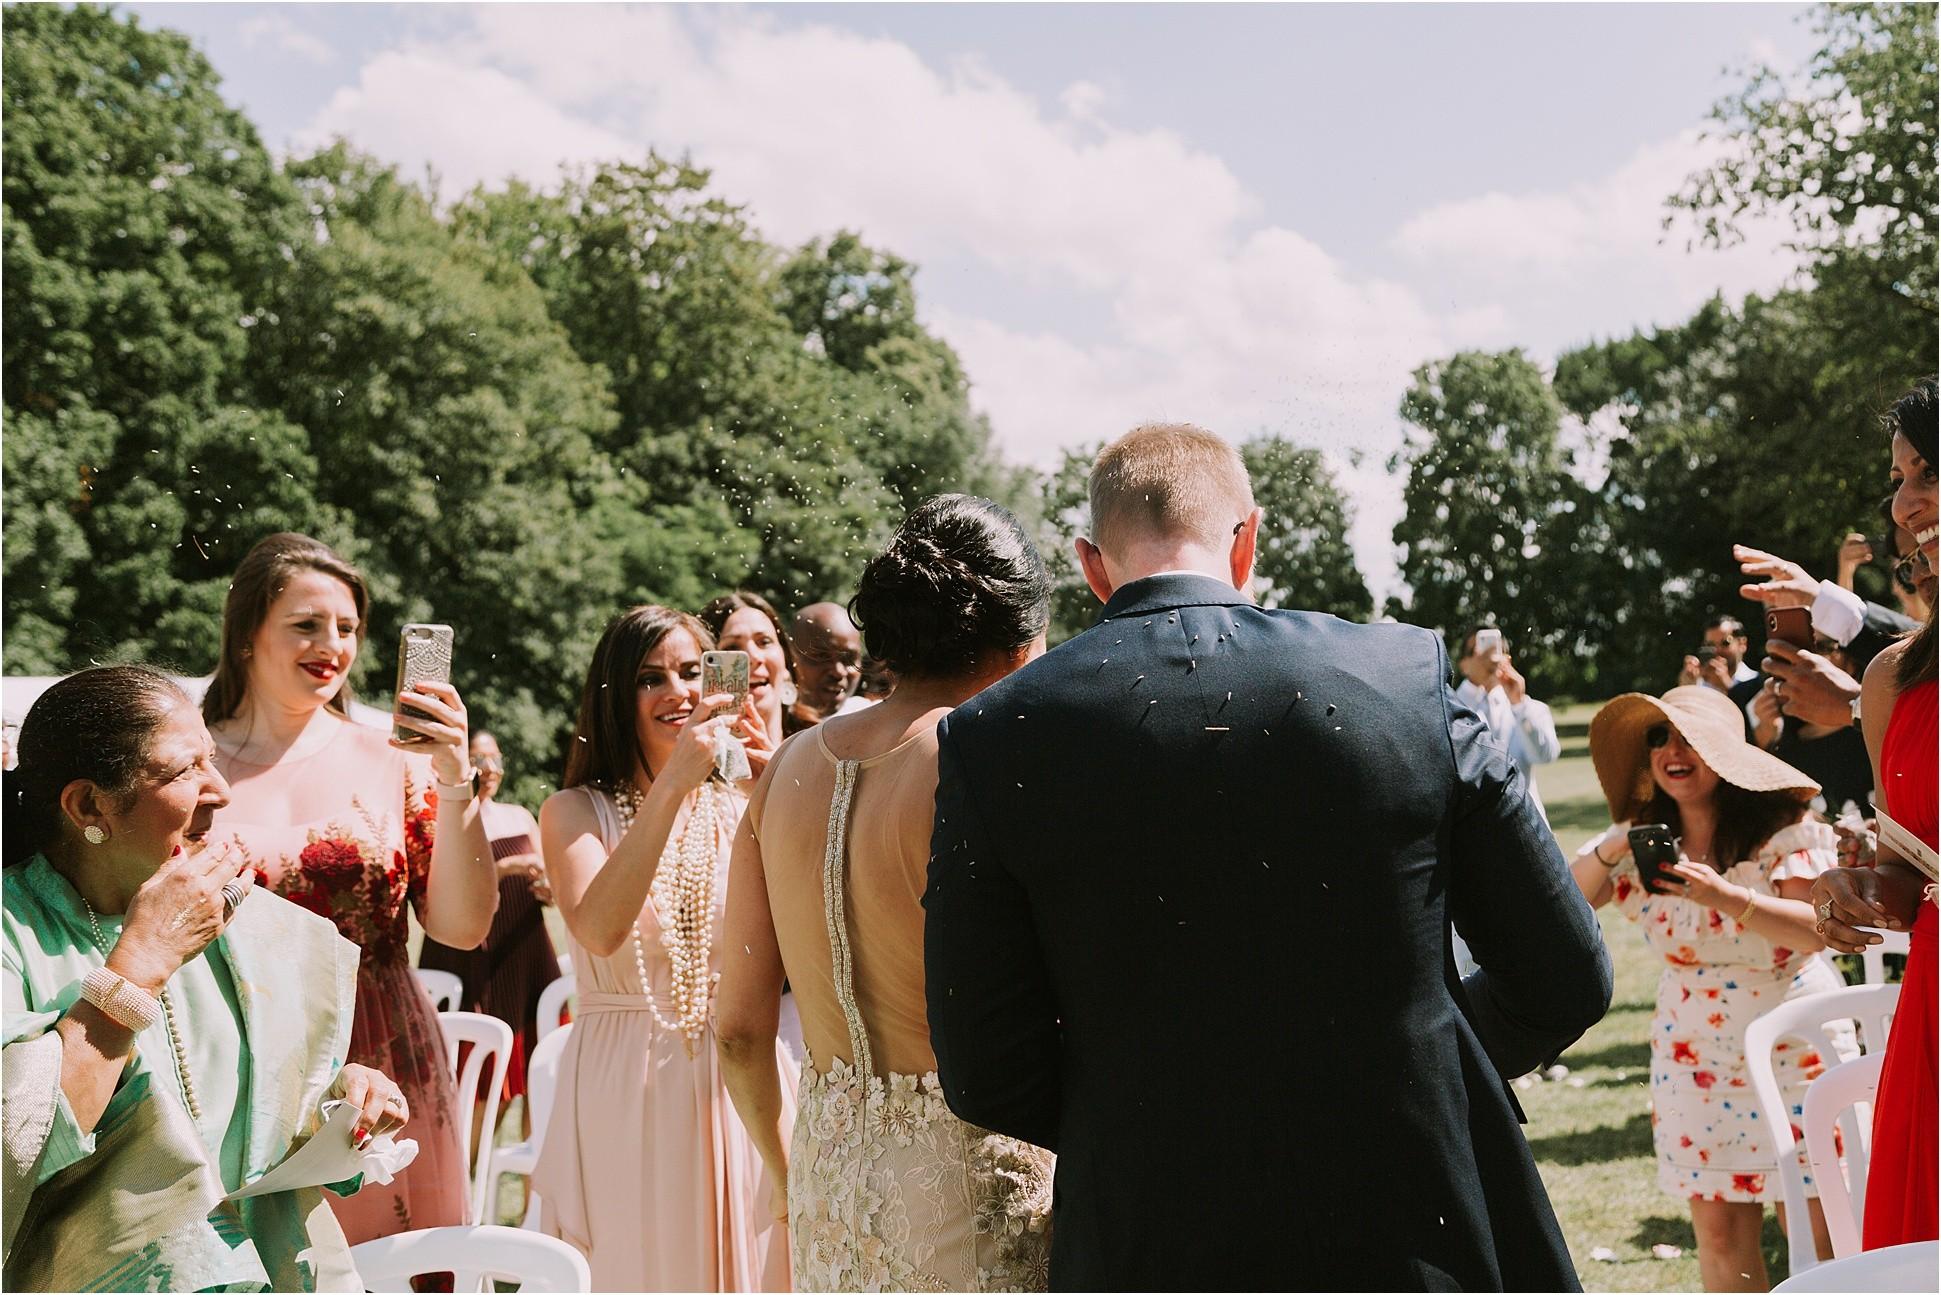 Kateryna-photos-photographe-mariage-chateau-st-paterne-mayenne-normandie_0121.jpg